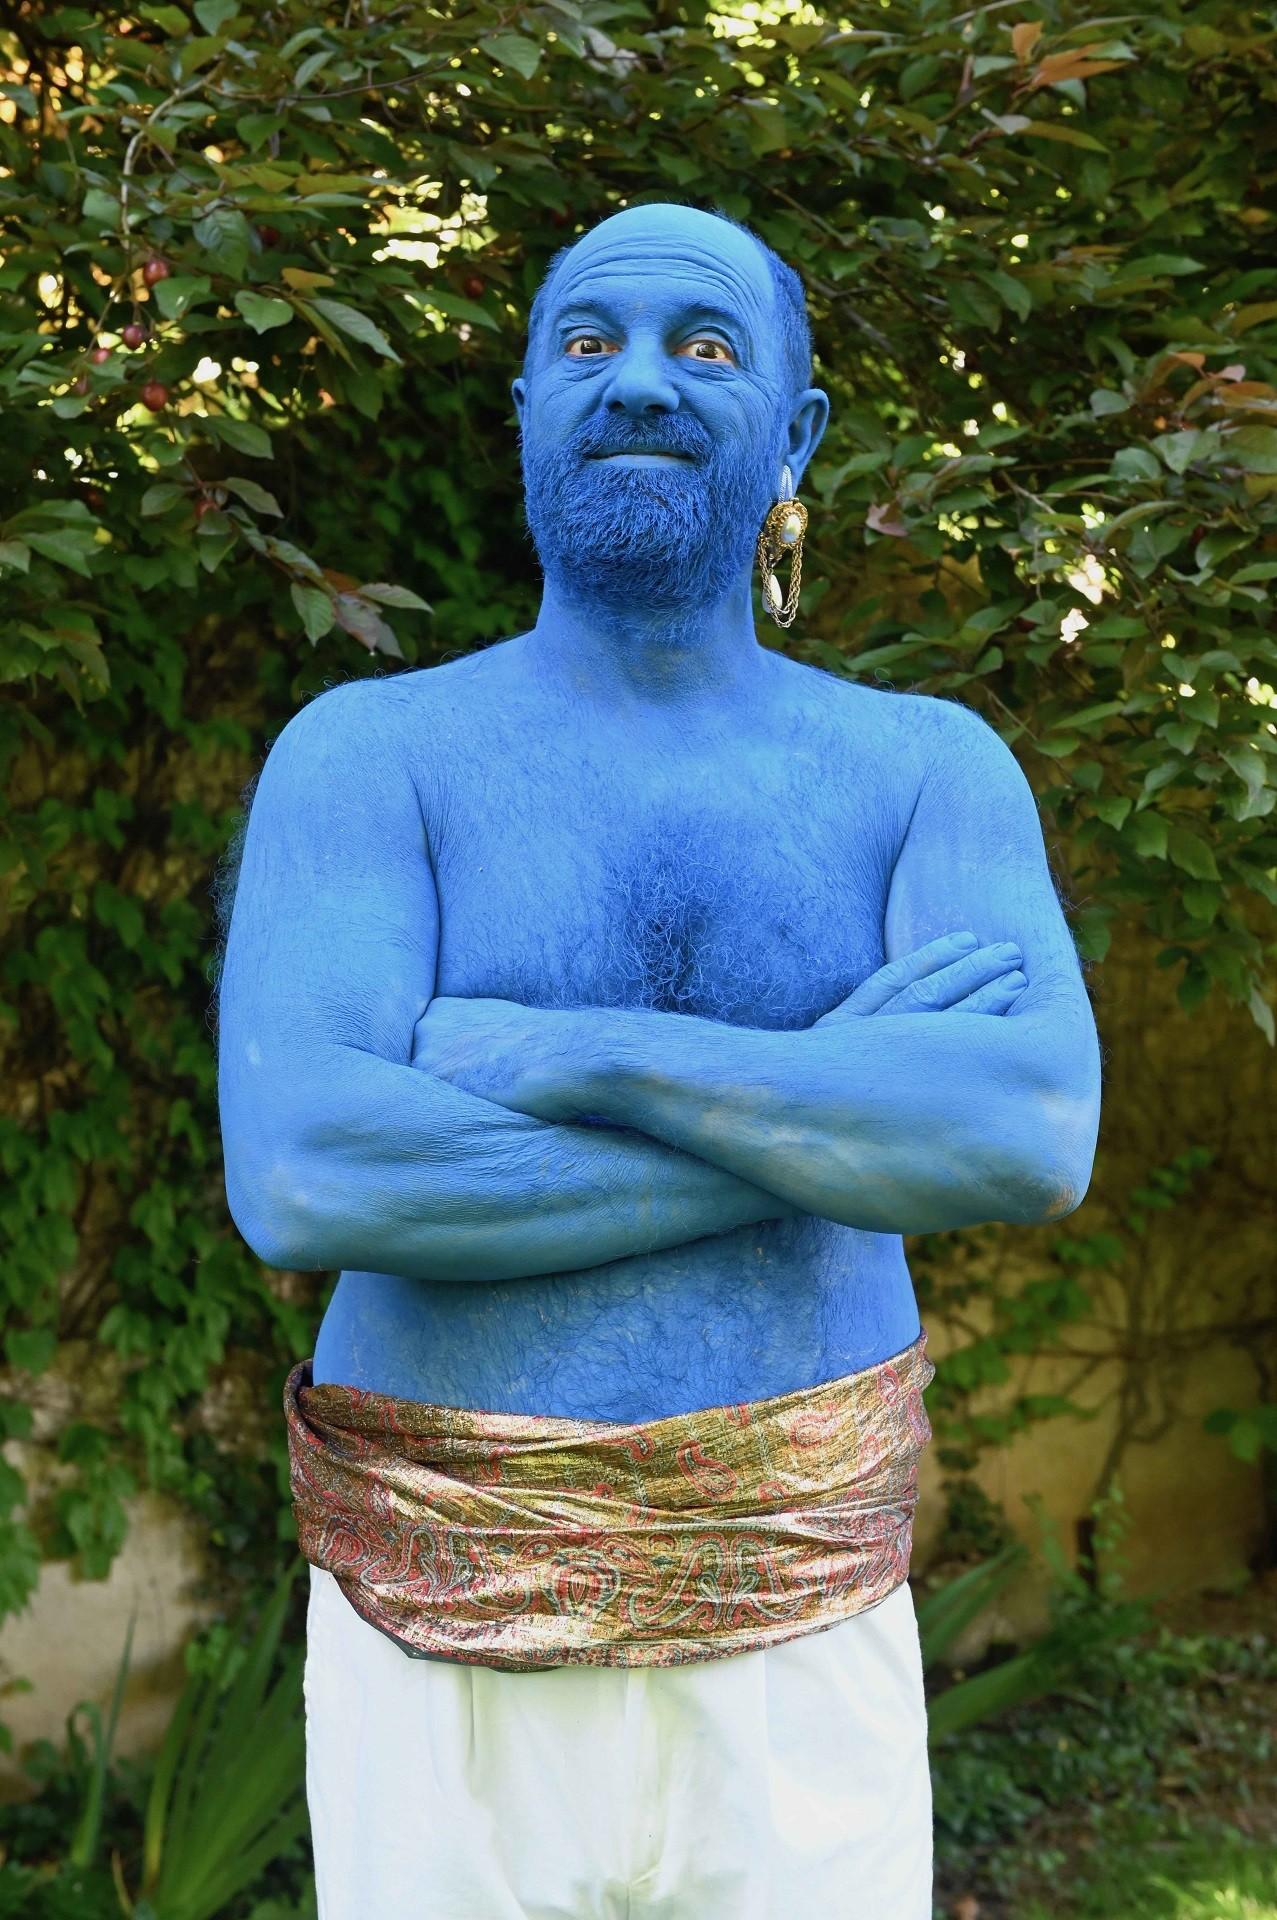 Mutant bleu